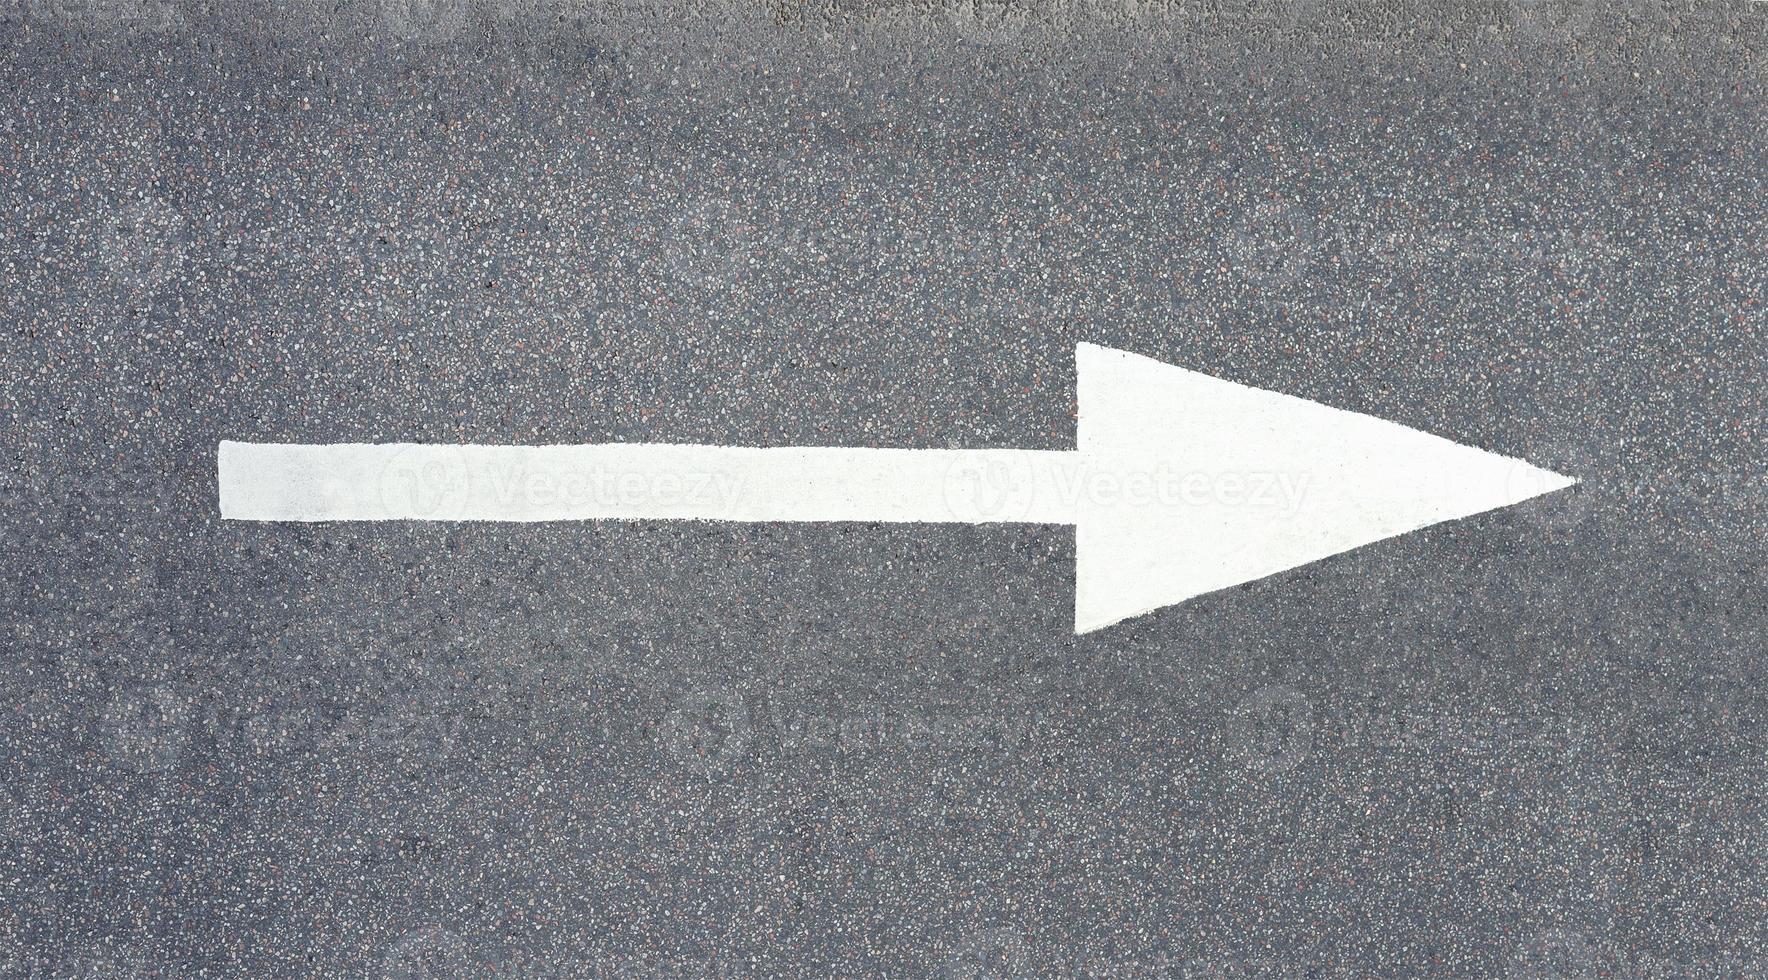 flèche peinte sur asphalte photo